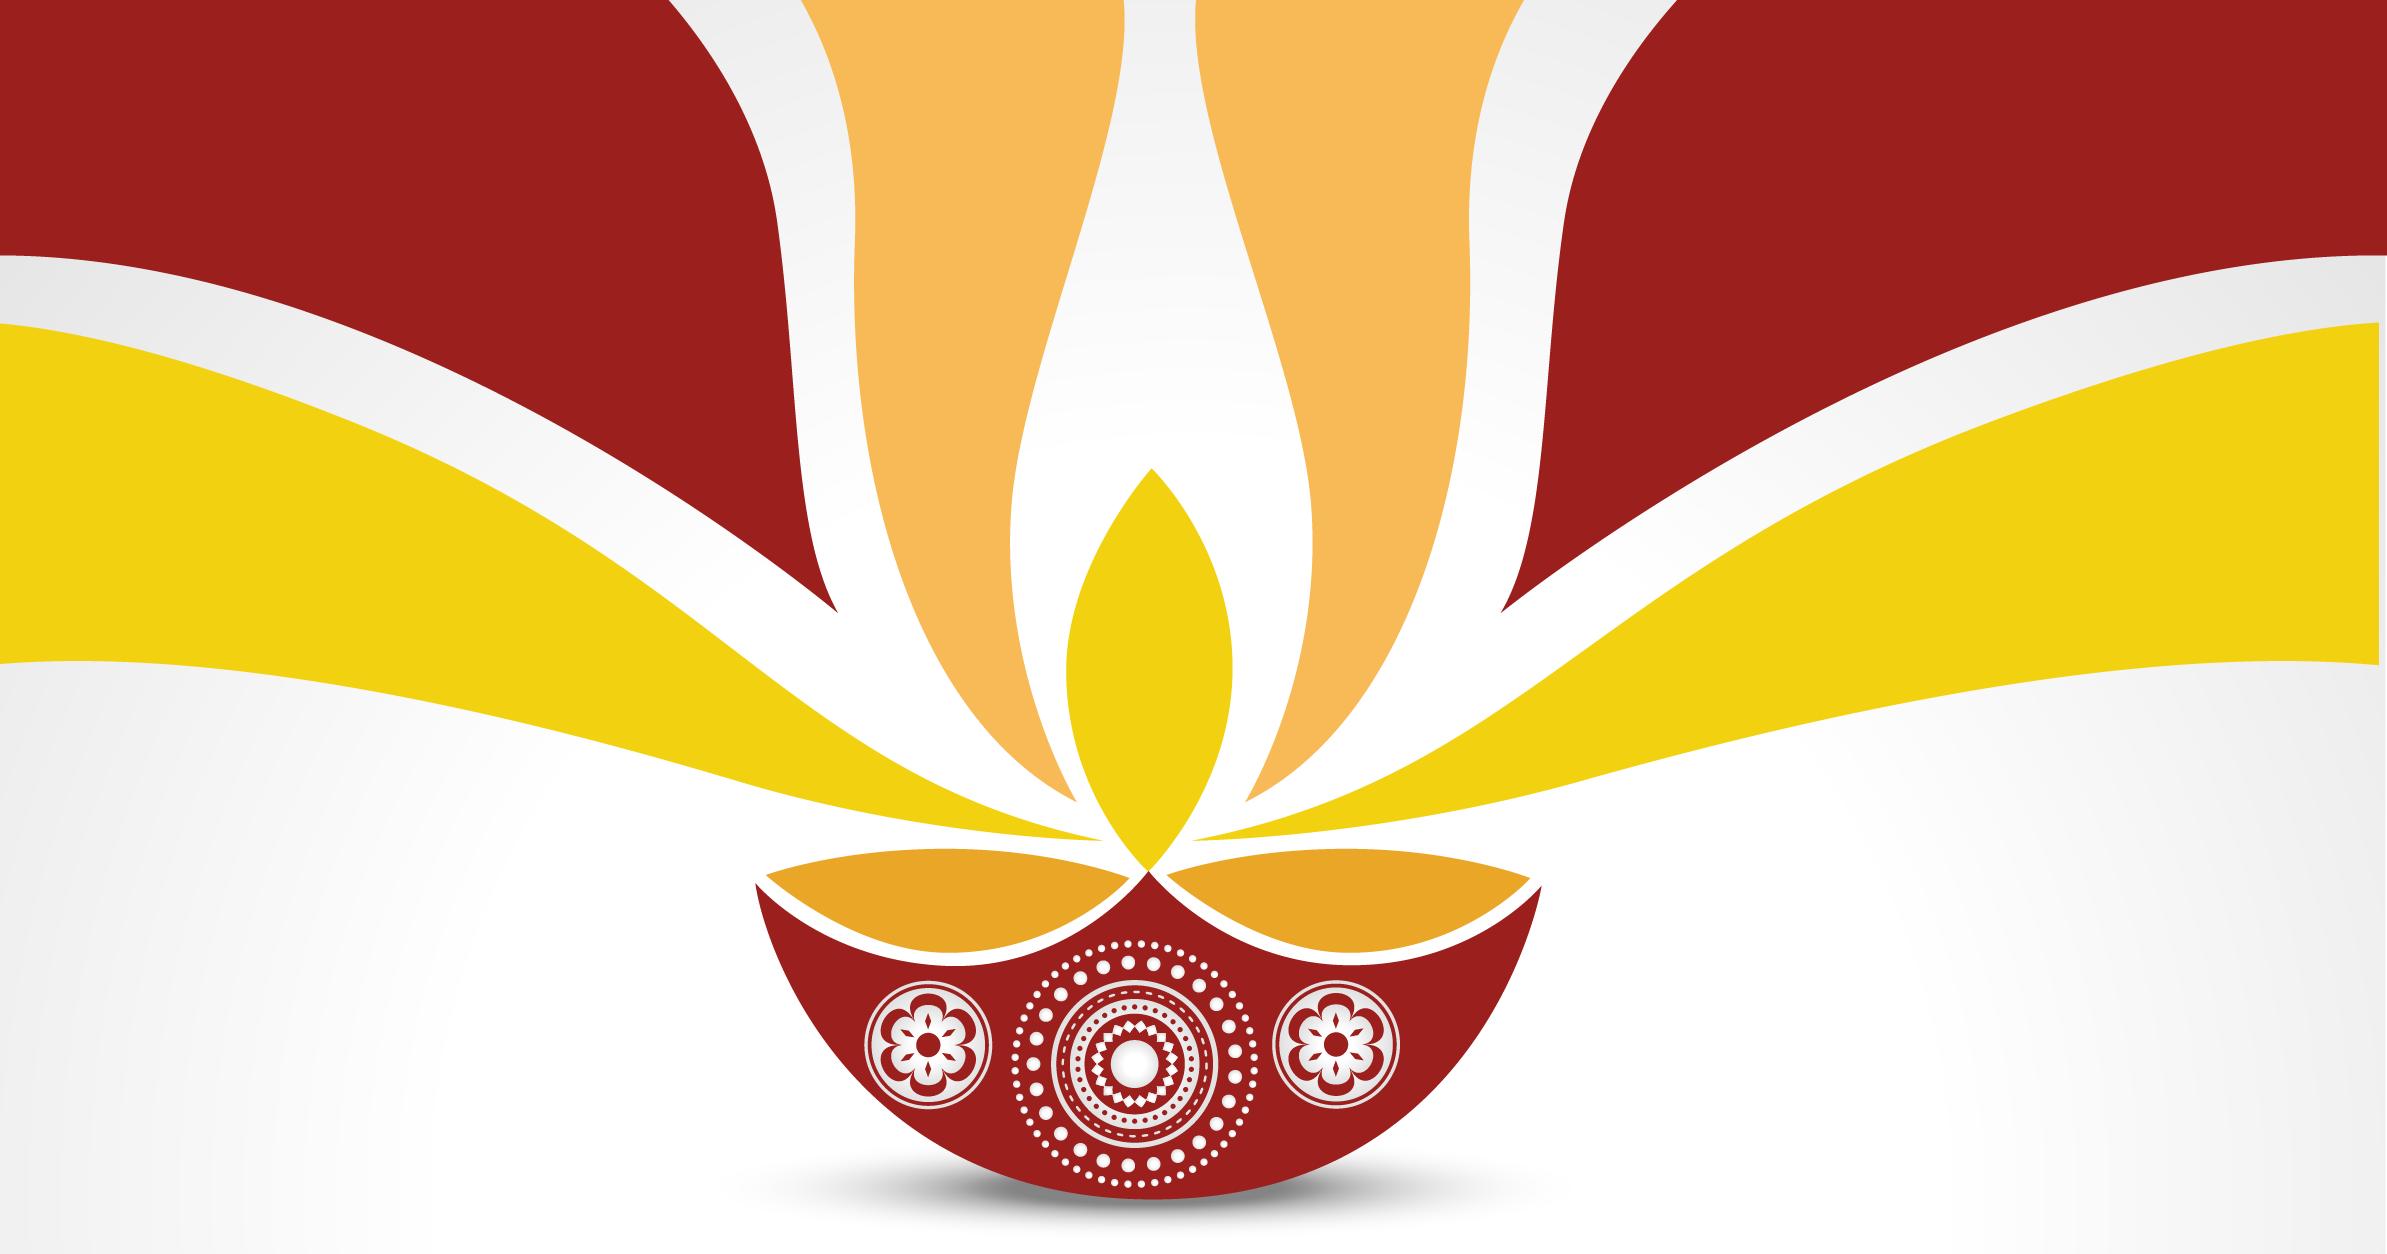 Diwali PNG image #30799 - Diwali PNG